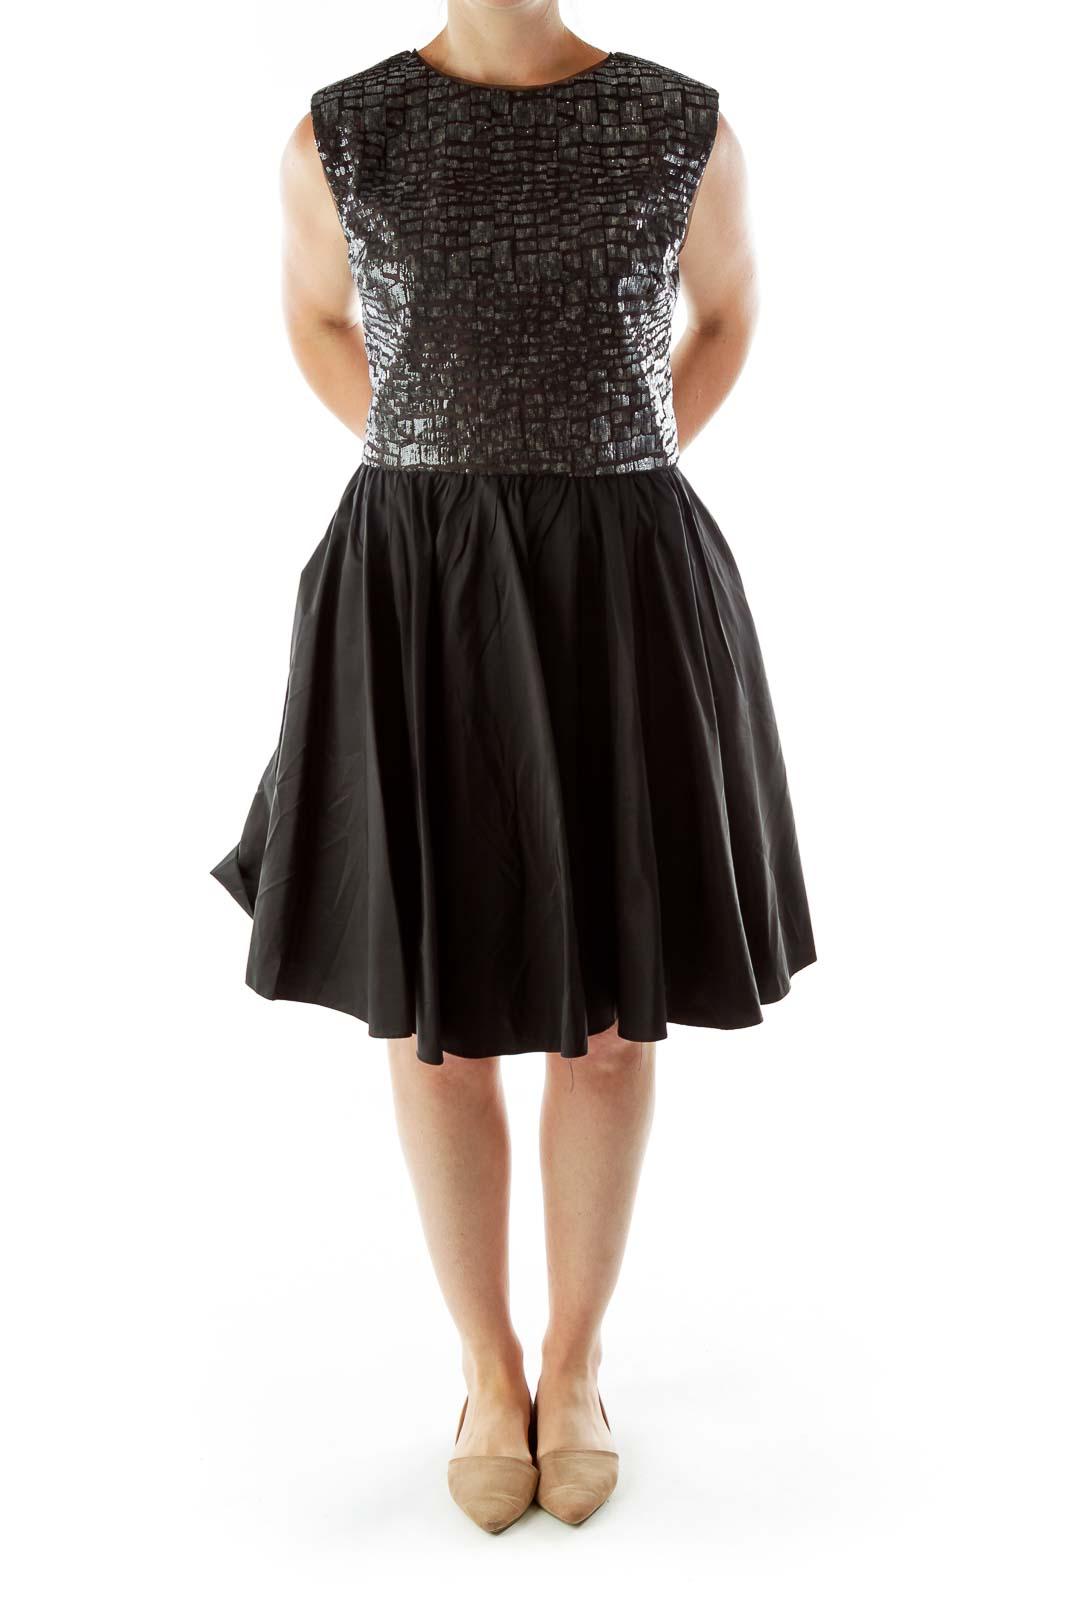 Black Sequined Open Back Evening Dress